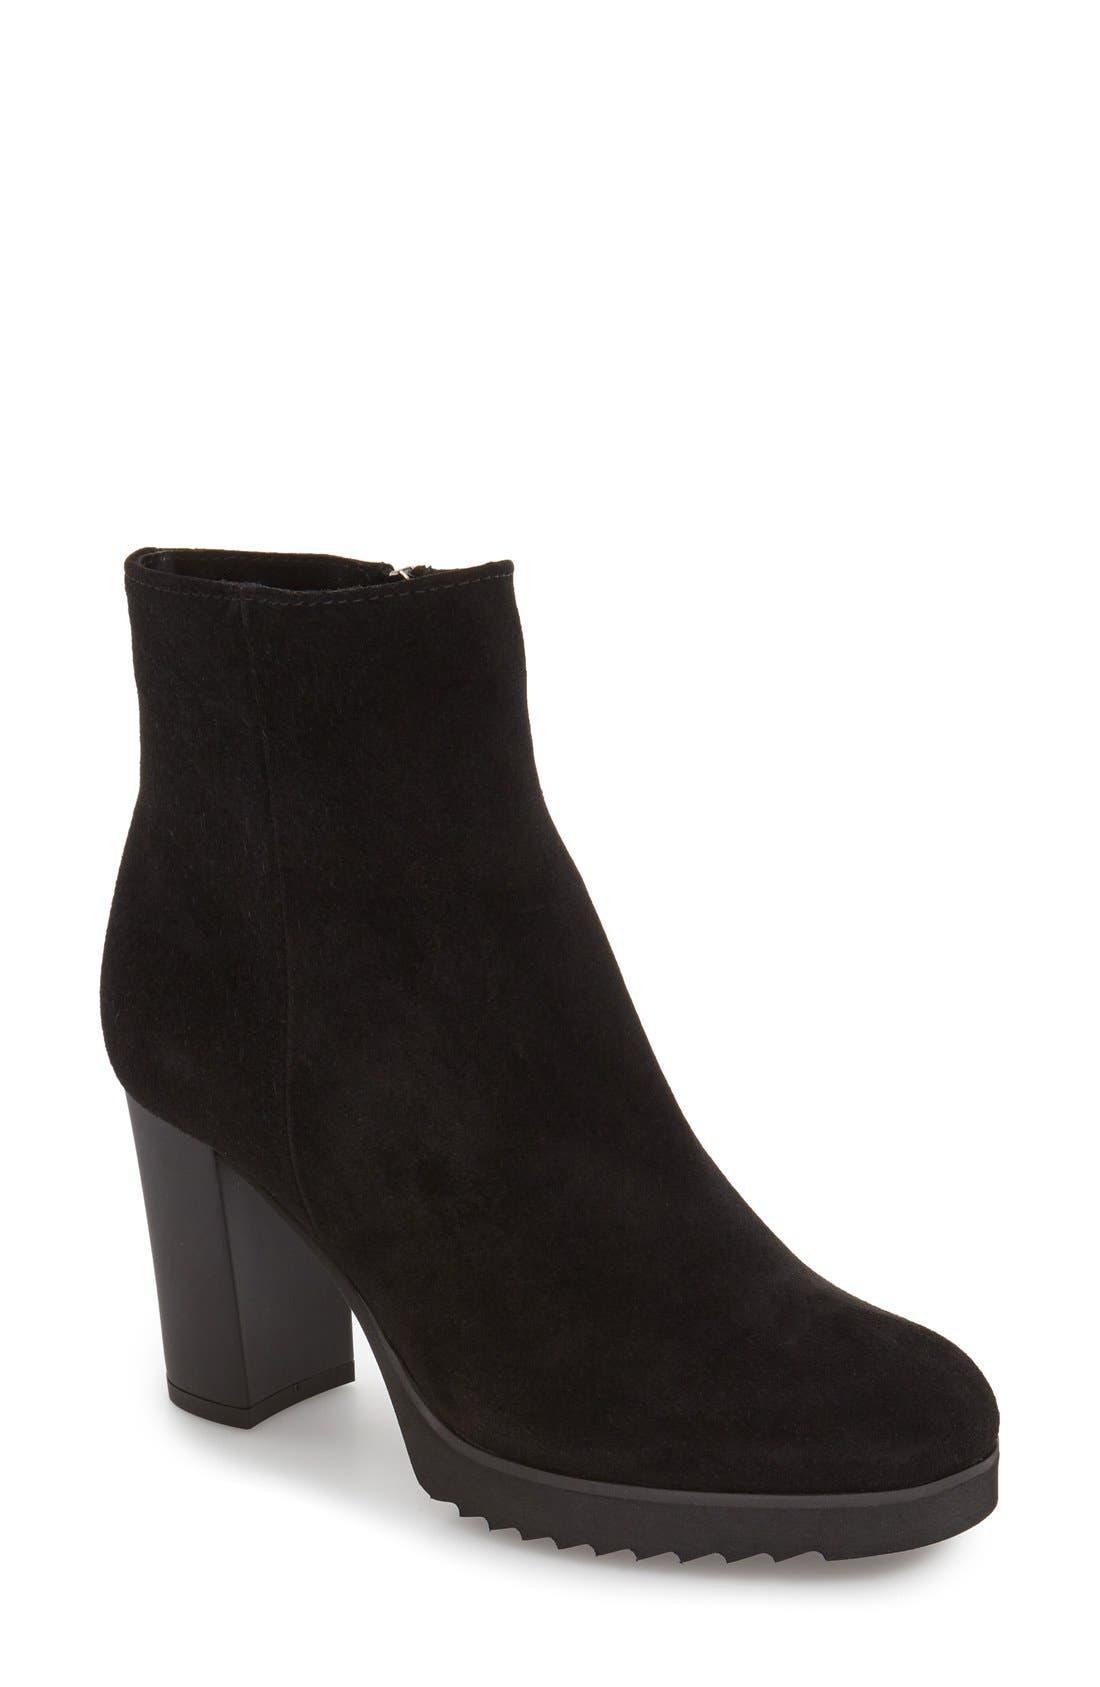 Alternate Image 1 Selected - La Canadienne 'Myranda' Waterproof Block Heel Bootie (Women)